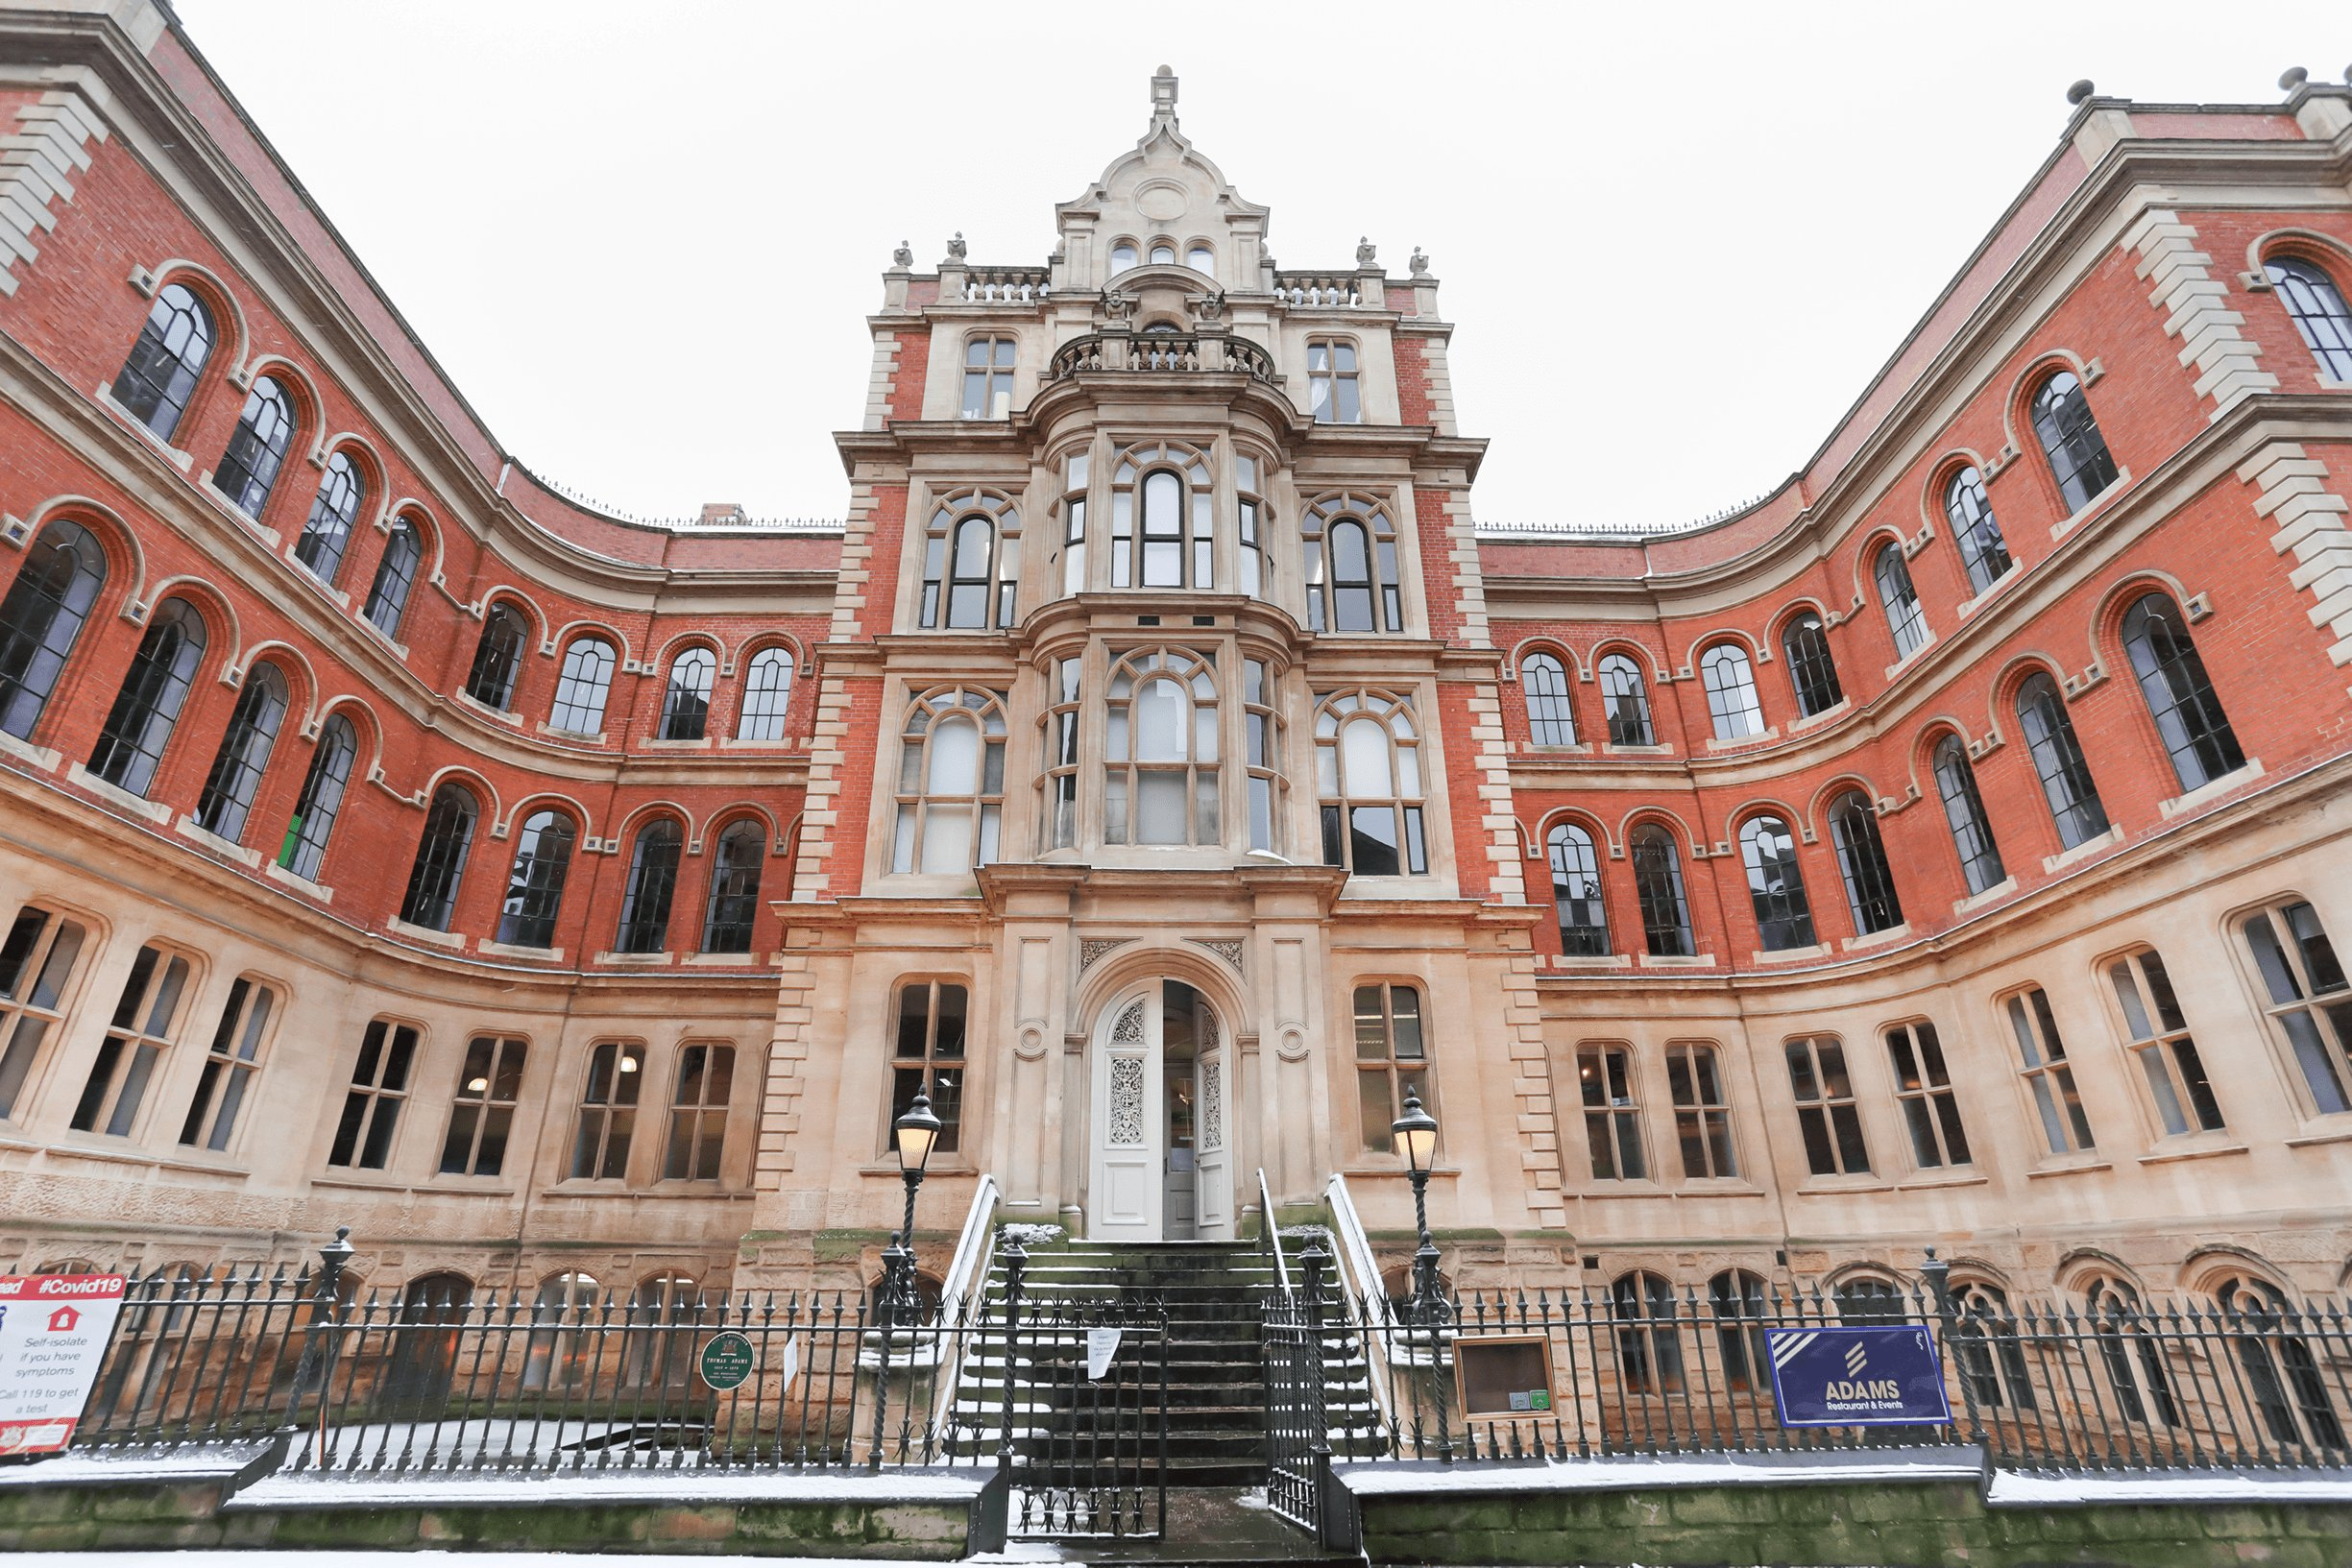 J Tomlinson completes comprehensive refurbishment of historic Grade II* college building in Nottingham